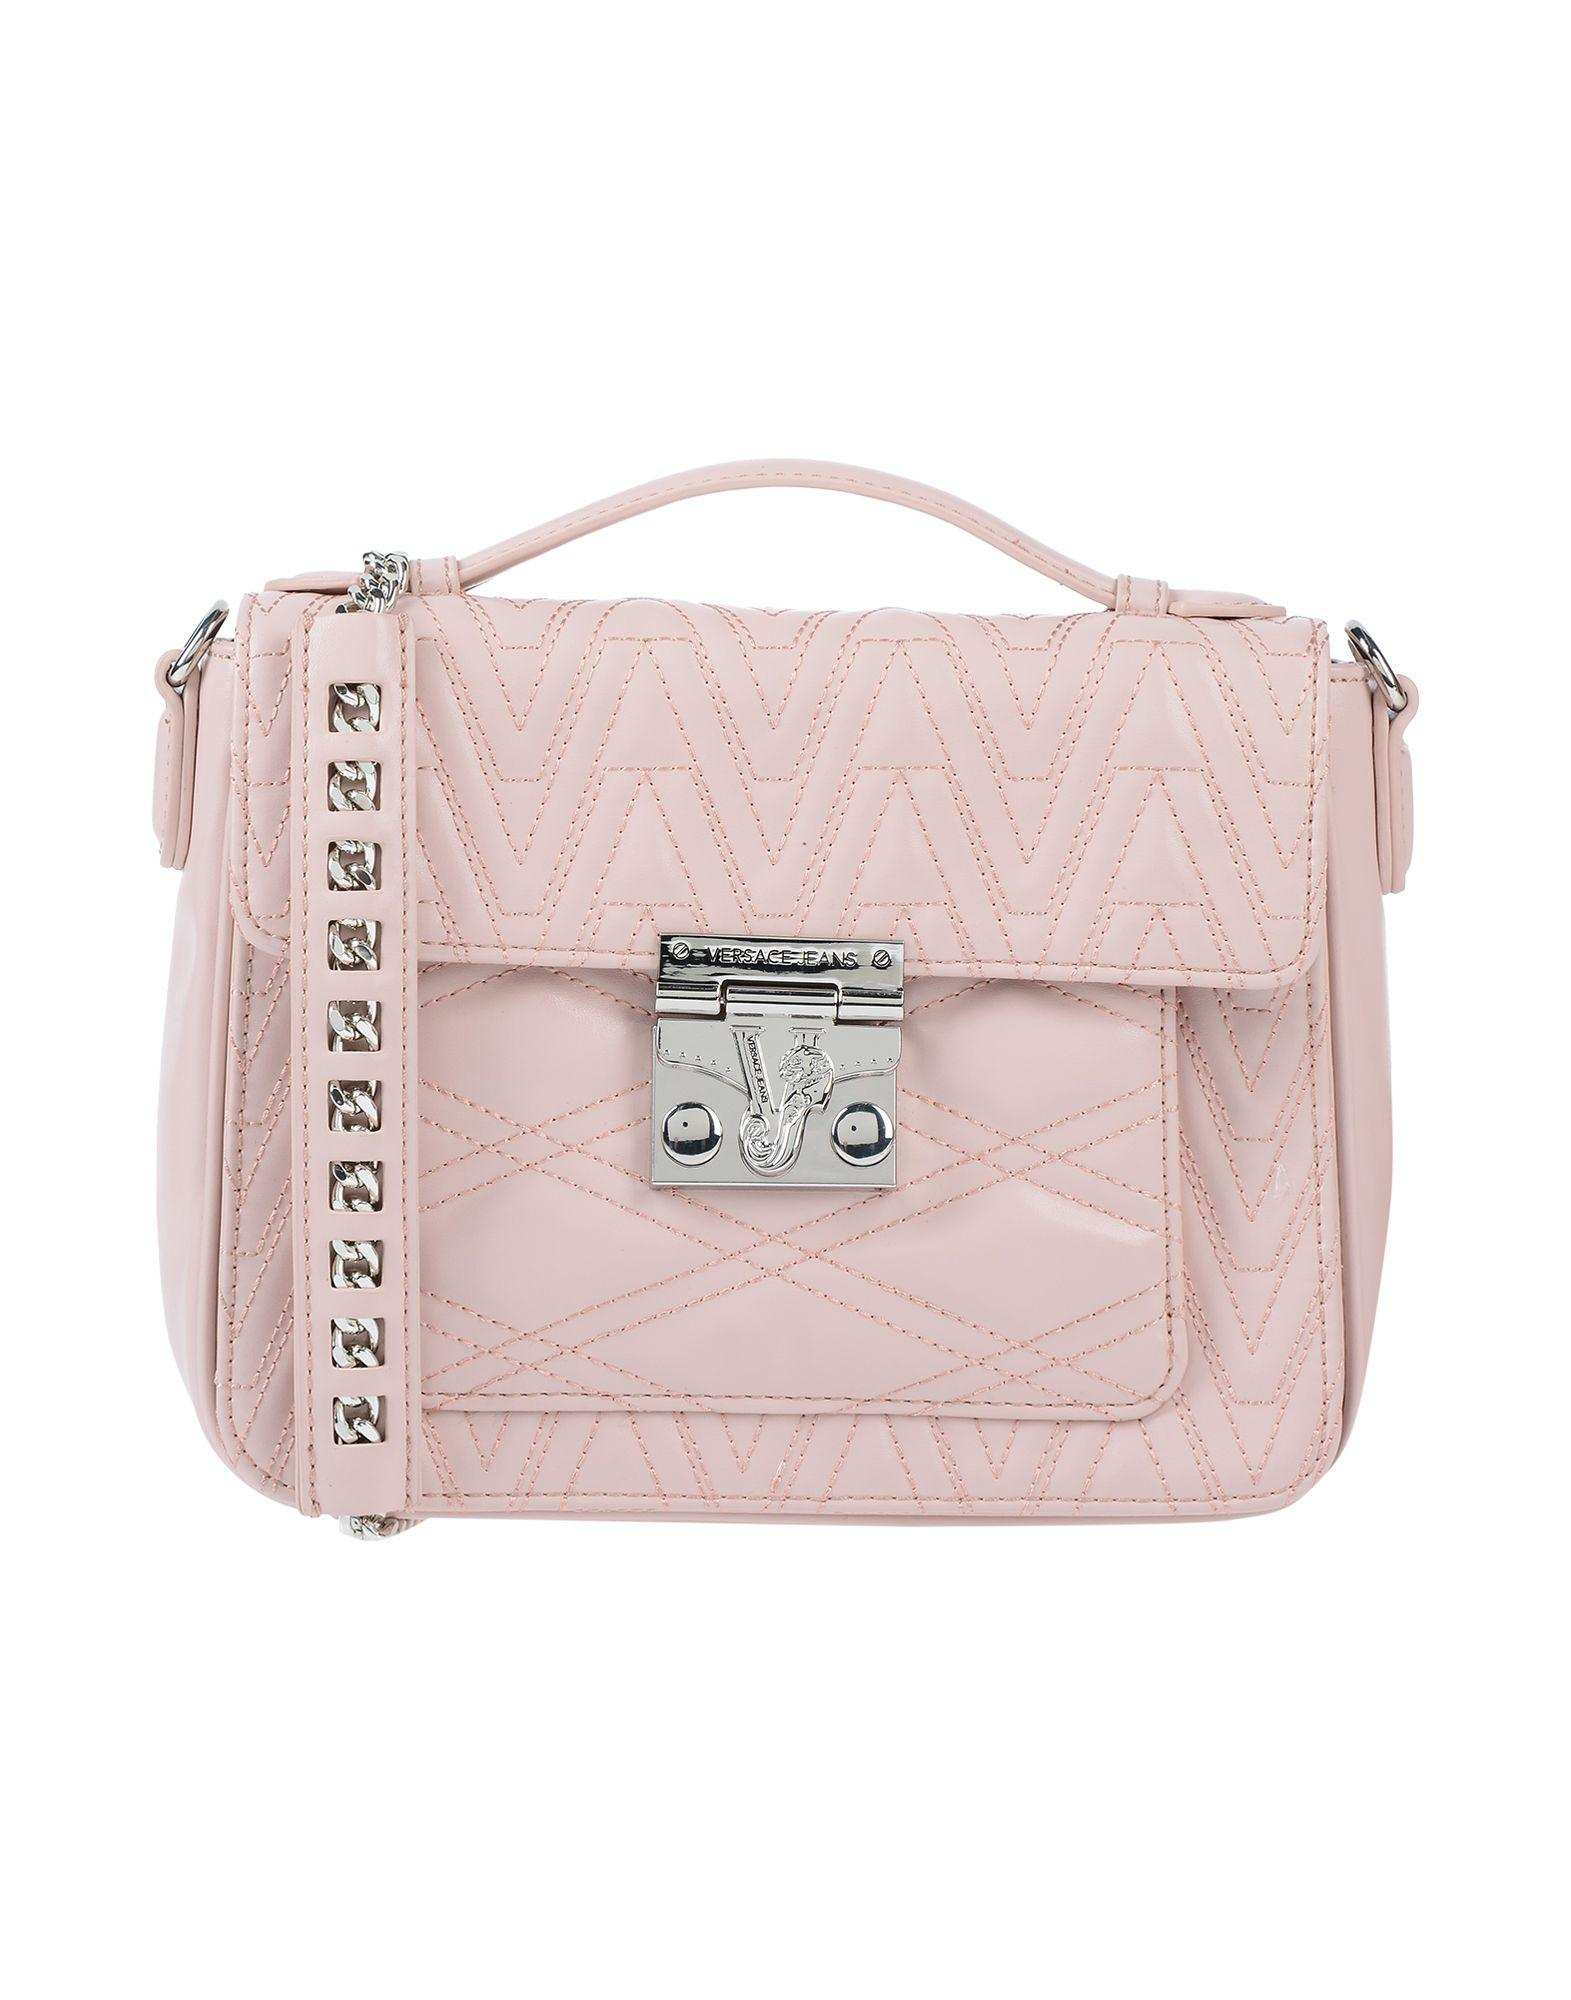 Versace Jeans Handbag in Pink - Lyst 7a6975bbec